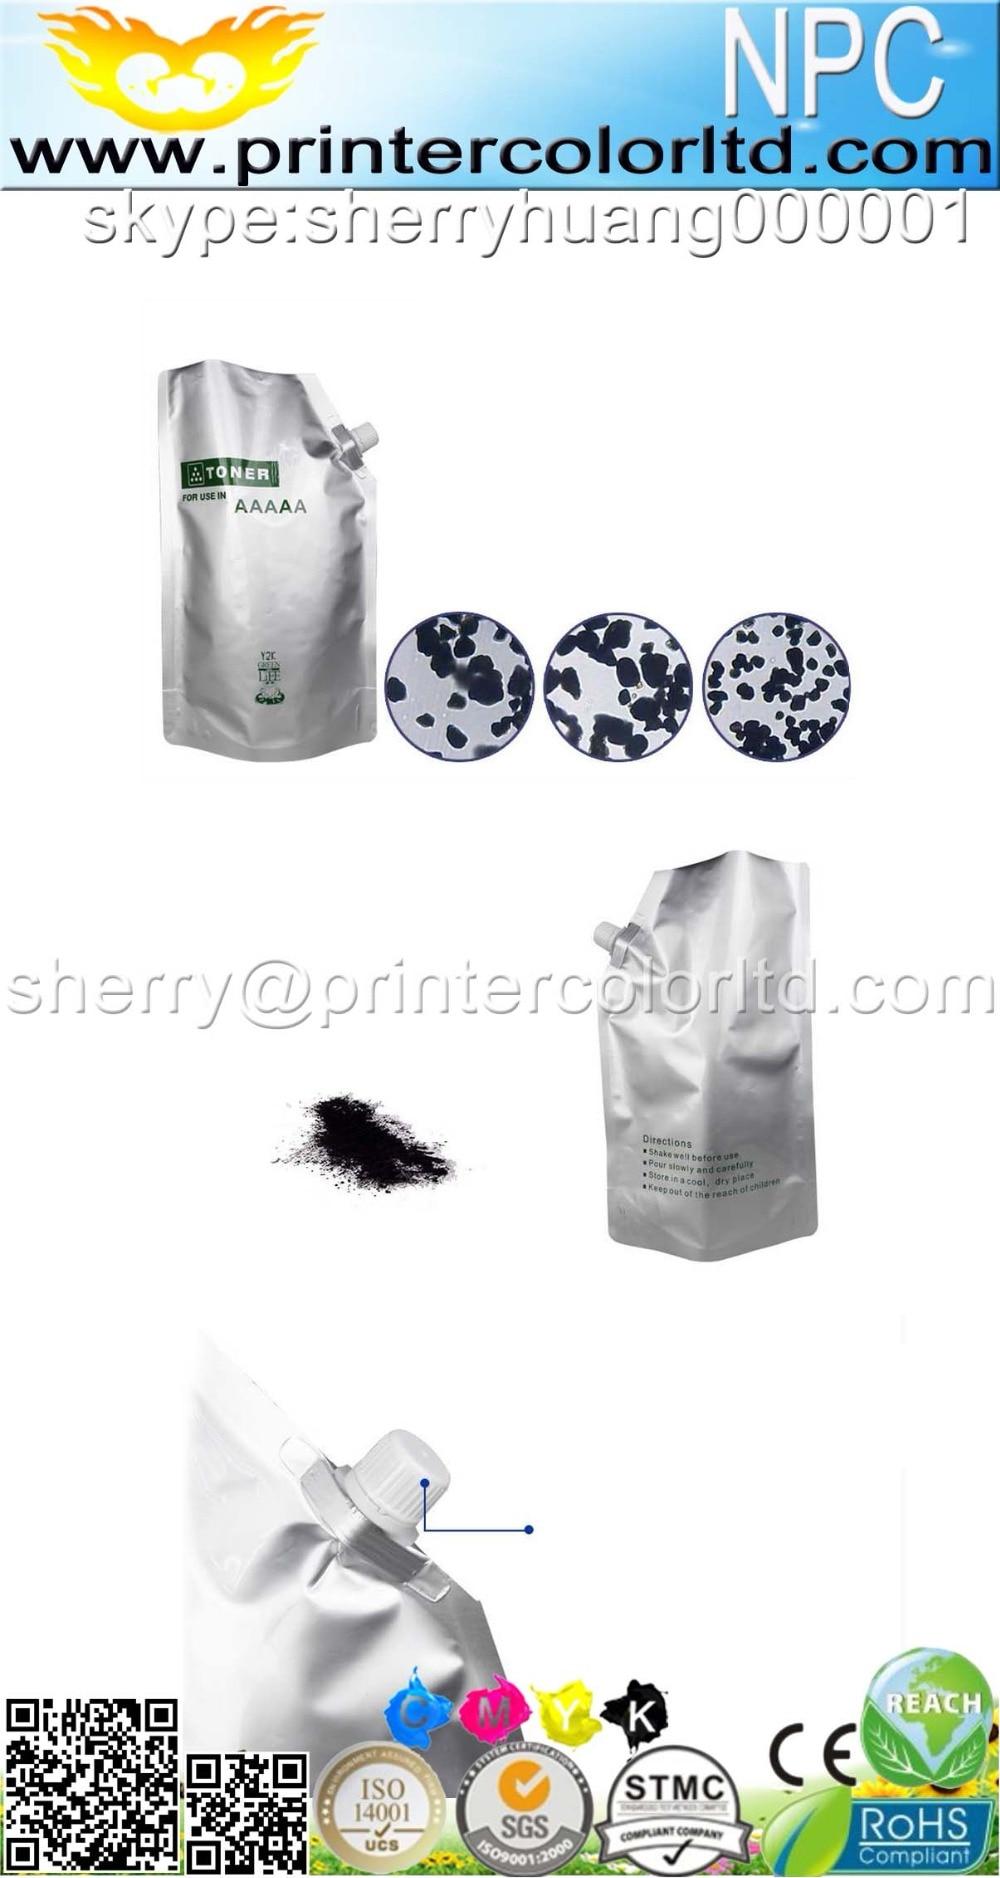 US $55 0 |1KG/bag toner powder for Kyocera Mita TASKalfa  4052ci/5052ci/6052ci/3552ci/for Copystar CS4052ci/CS5052ci/CS6052ci  /CS3552ci -in Toner